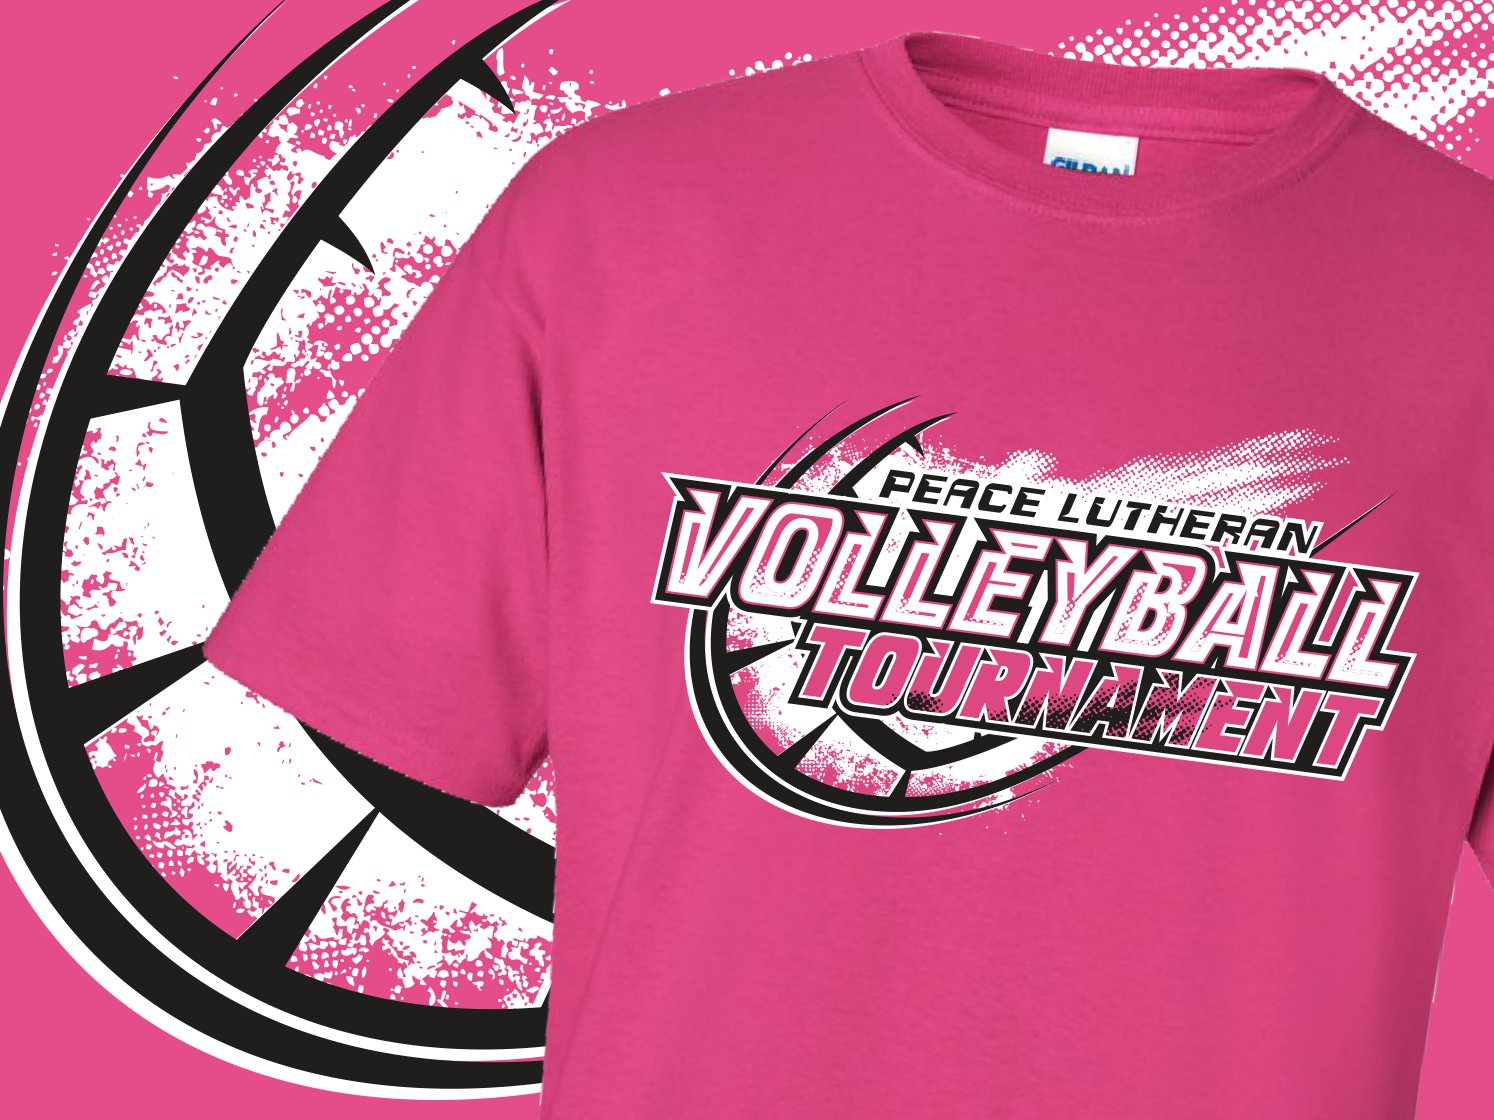 ab904558c Custom Volleyball Jerseys & Team Apparel | Grasel Graphics